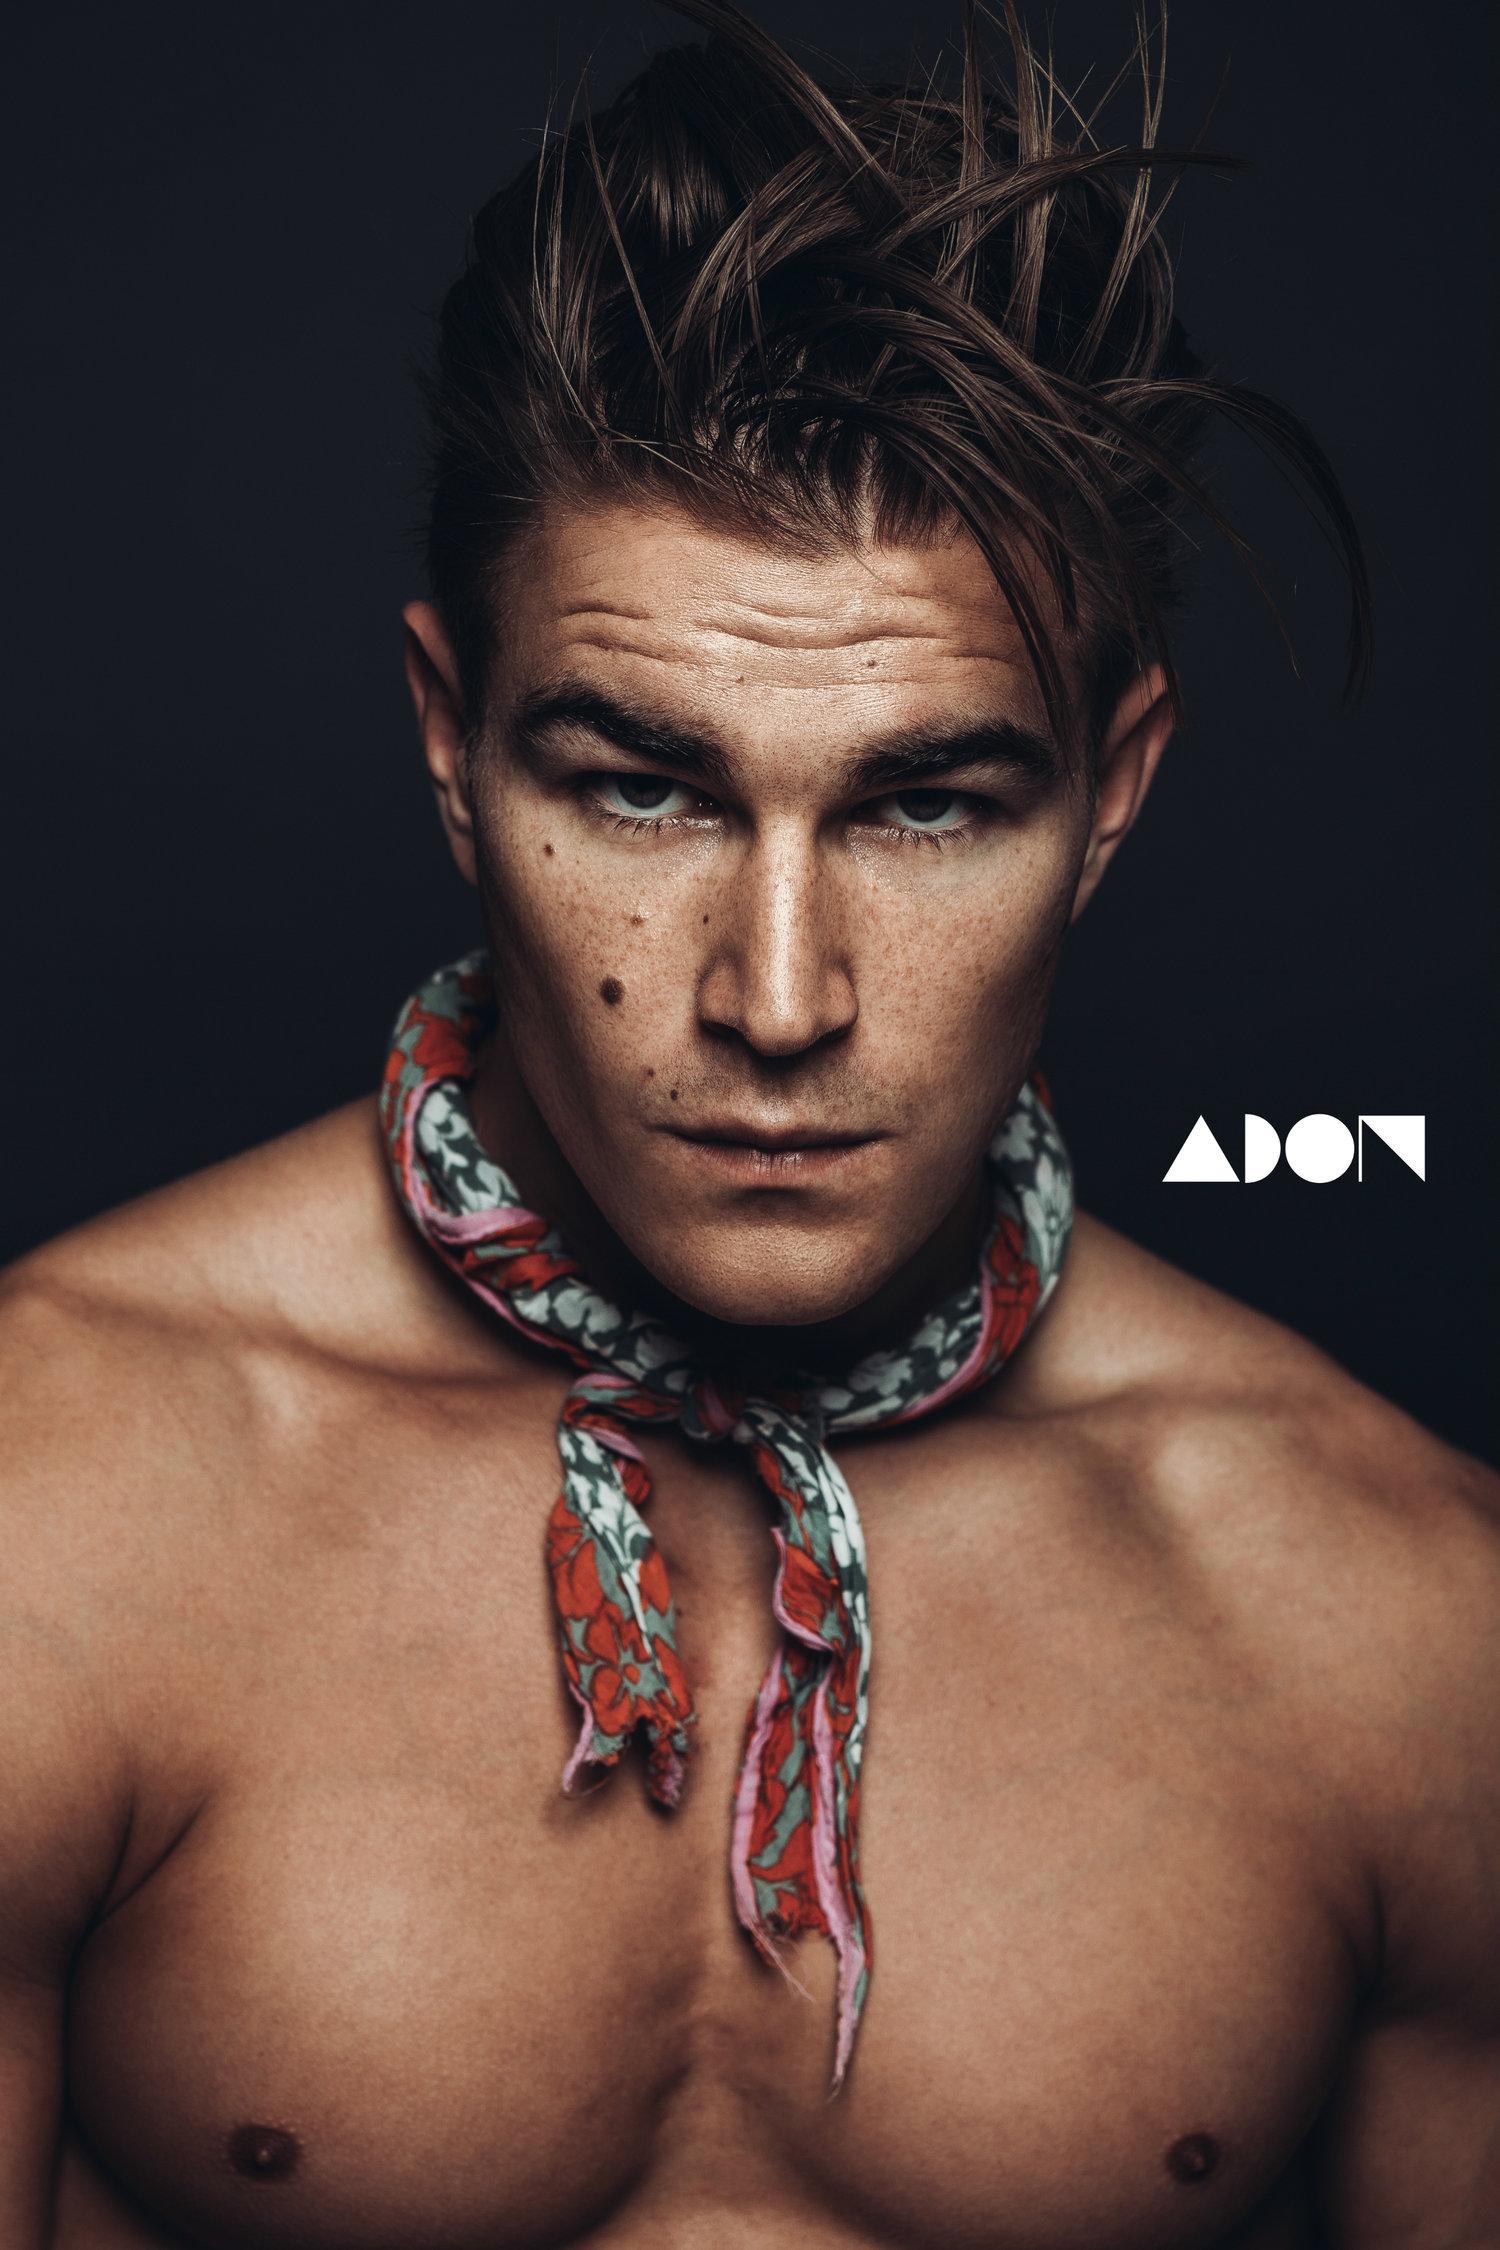 Adon Exclusive: Model Anton Engel By Ivan Avila